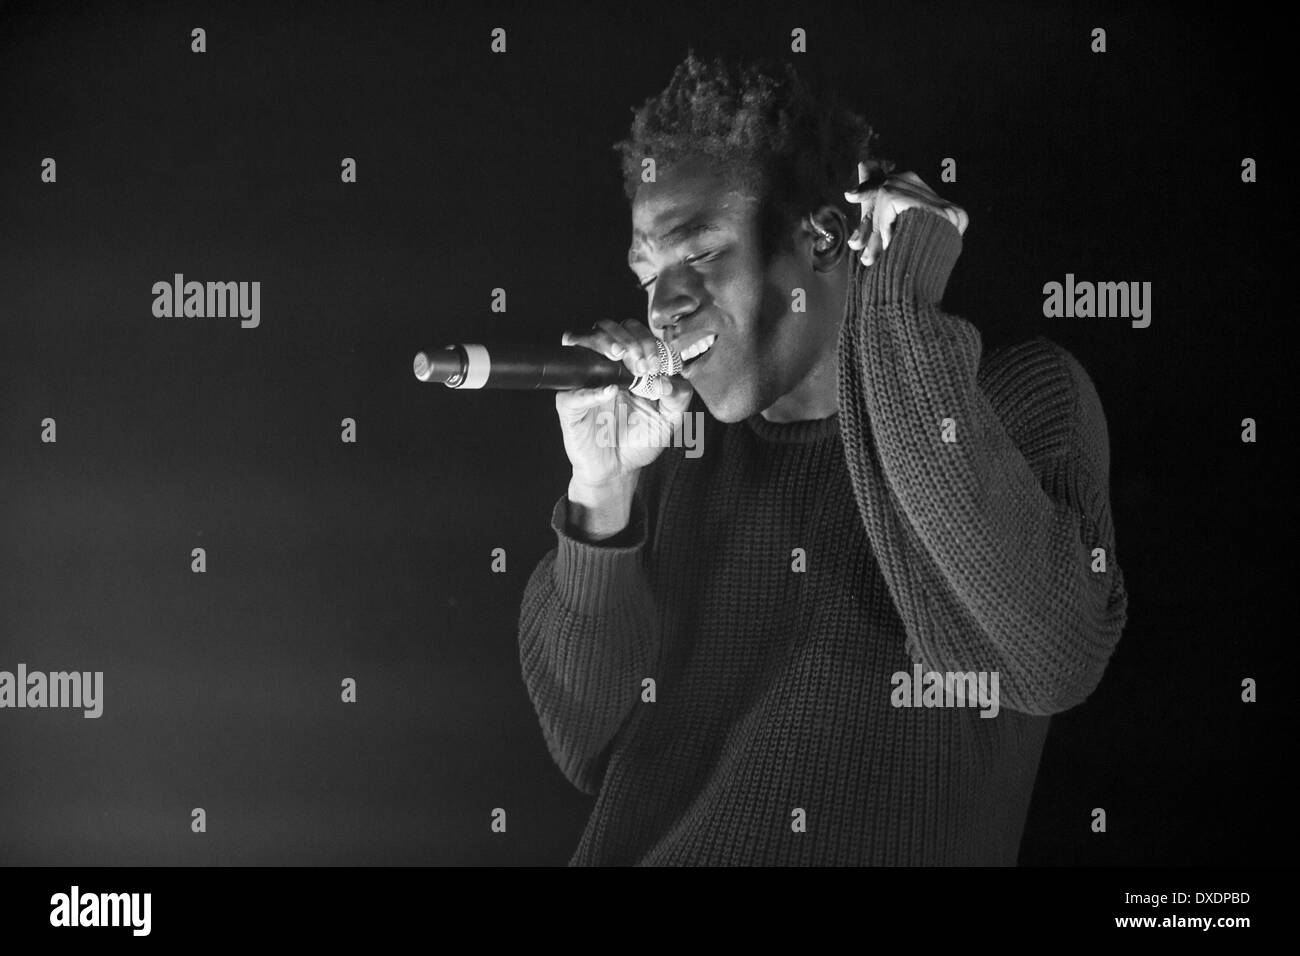 Milwaukee, Wisconsin, USA. 21st Mar, 2014. Rapper CHILDISH GAMBINO (aka DONALD GLOVER) performs live at The Rave's Eagles Ballroom in Milwaukee, Wisconsin © Daniel DeSlover/ZUMAPRESS.com/Alamy Live News - Stock Image